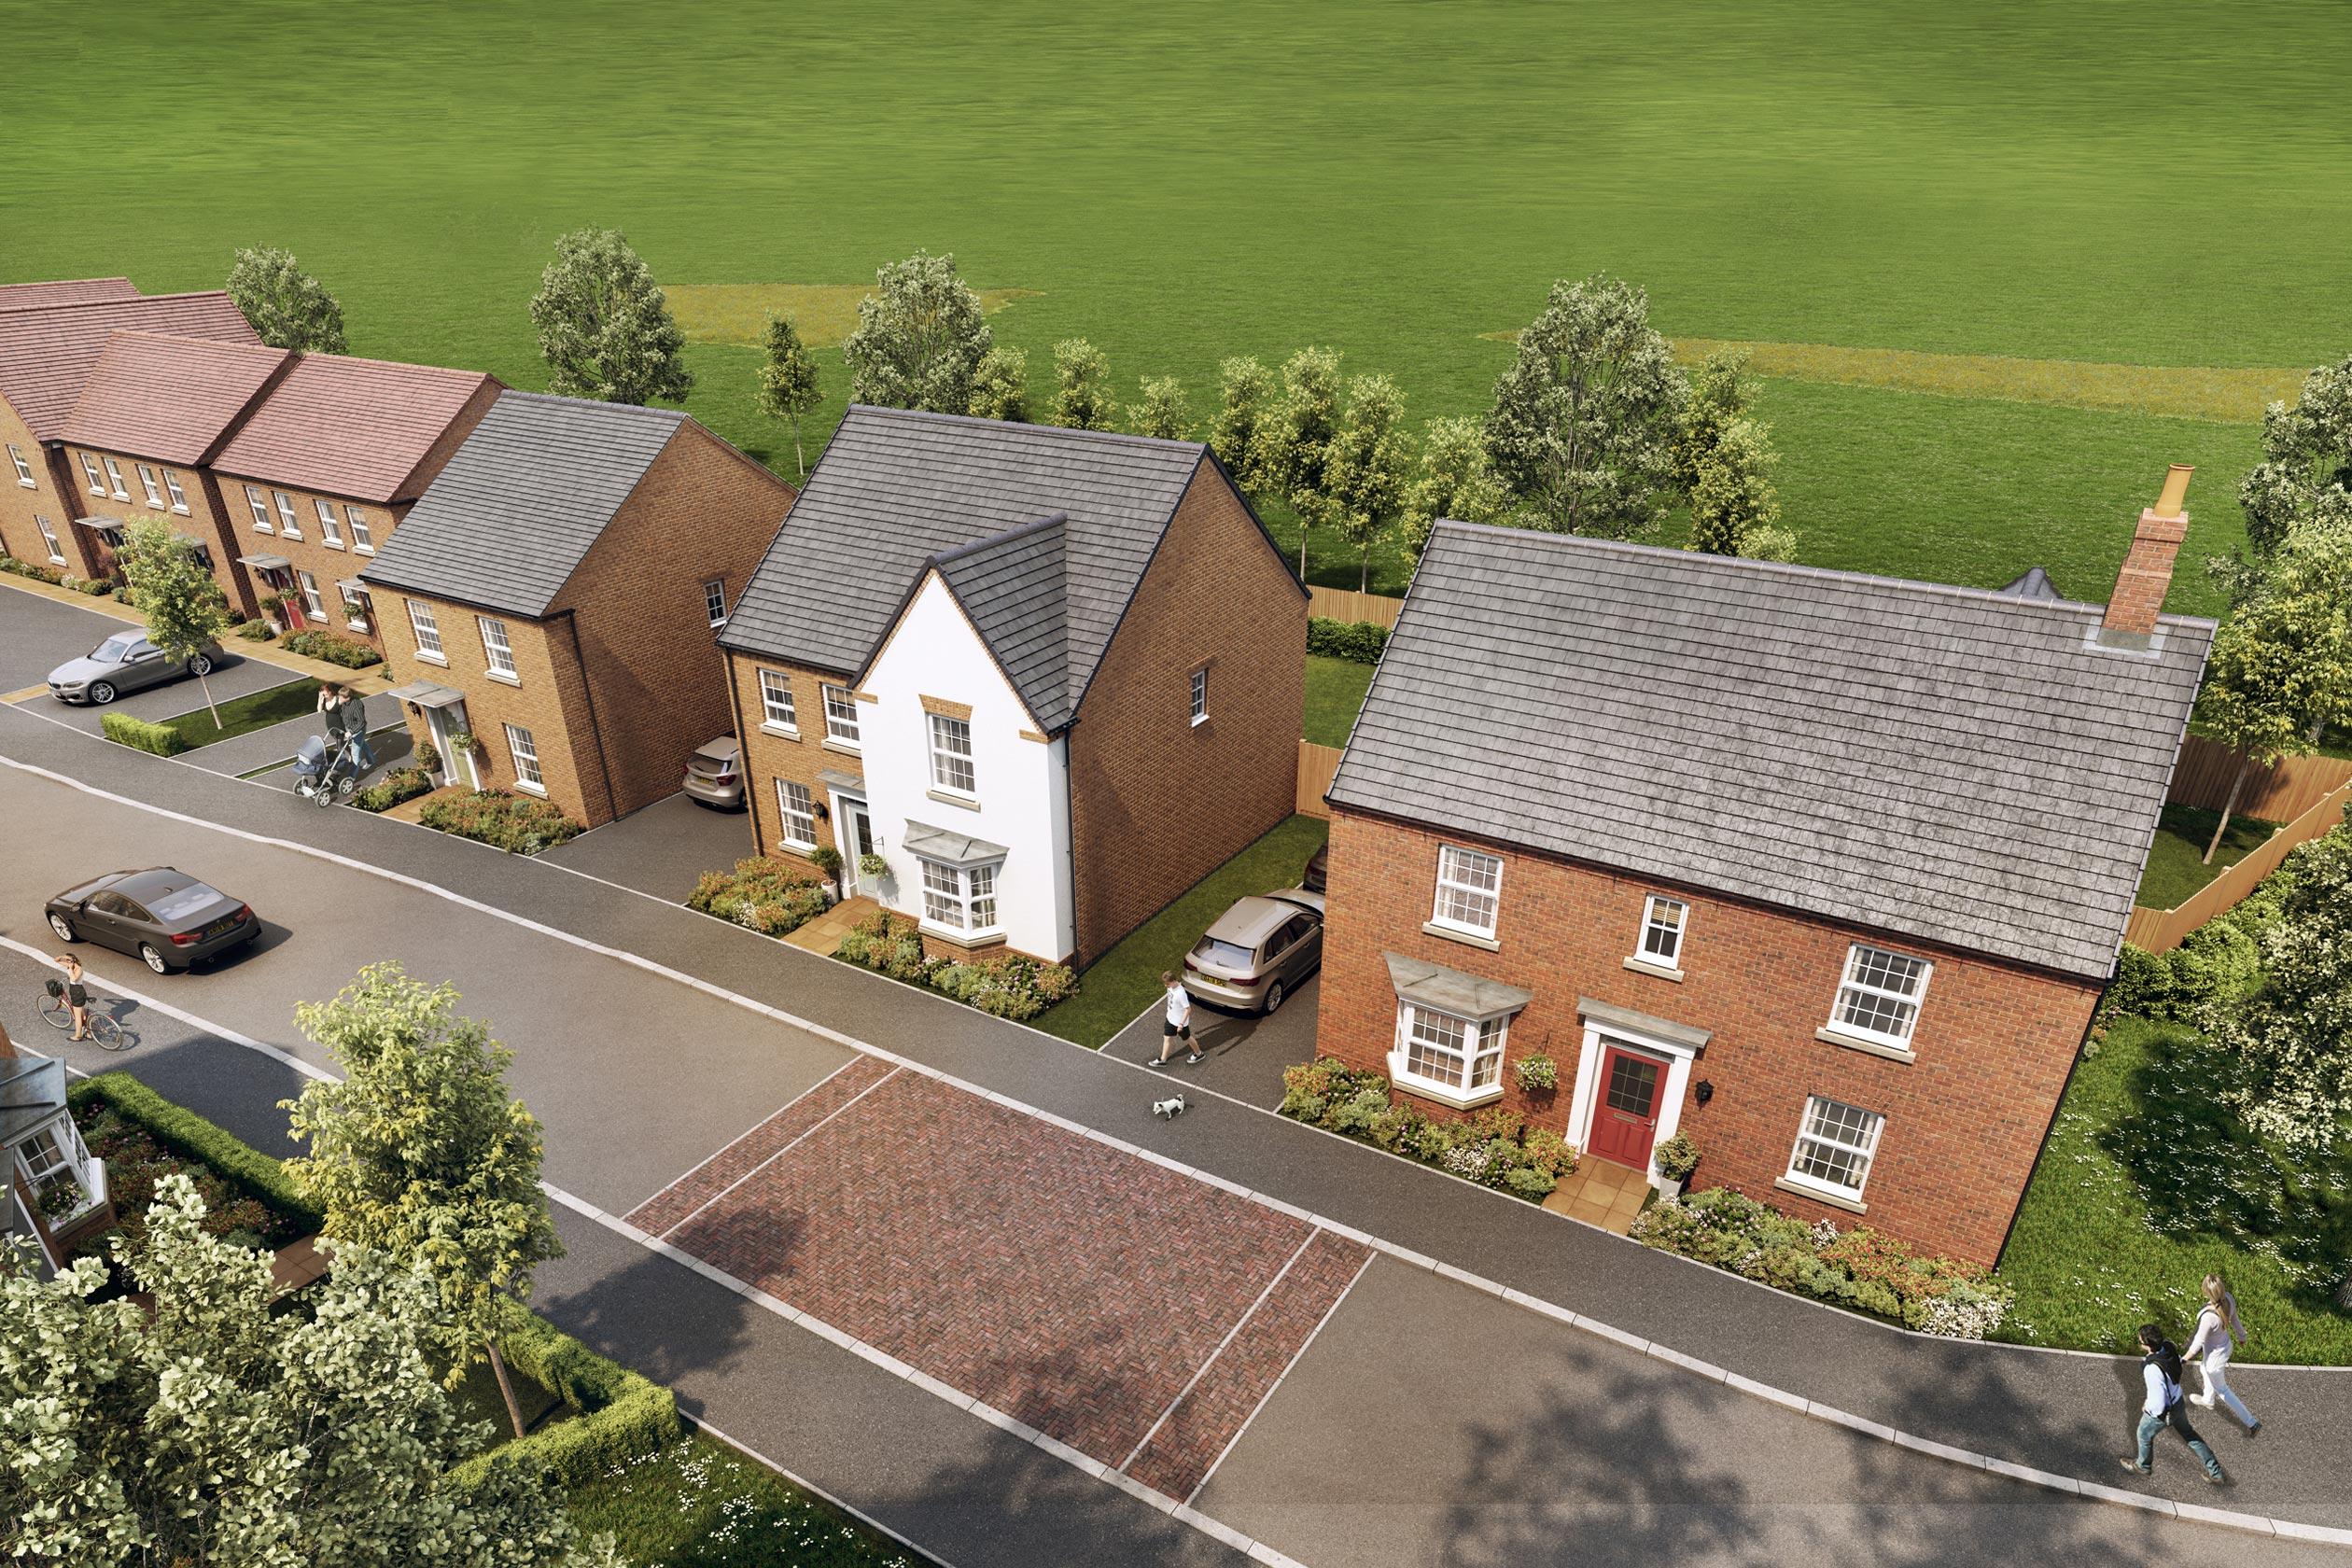 New Build Homes in Kibworth